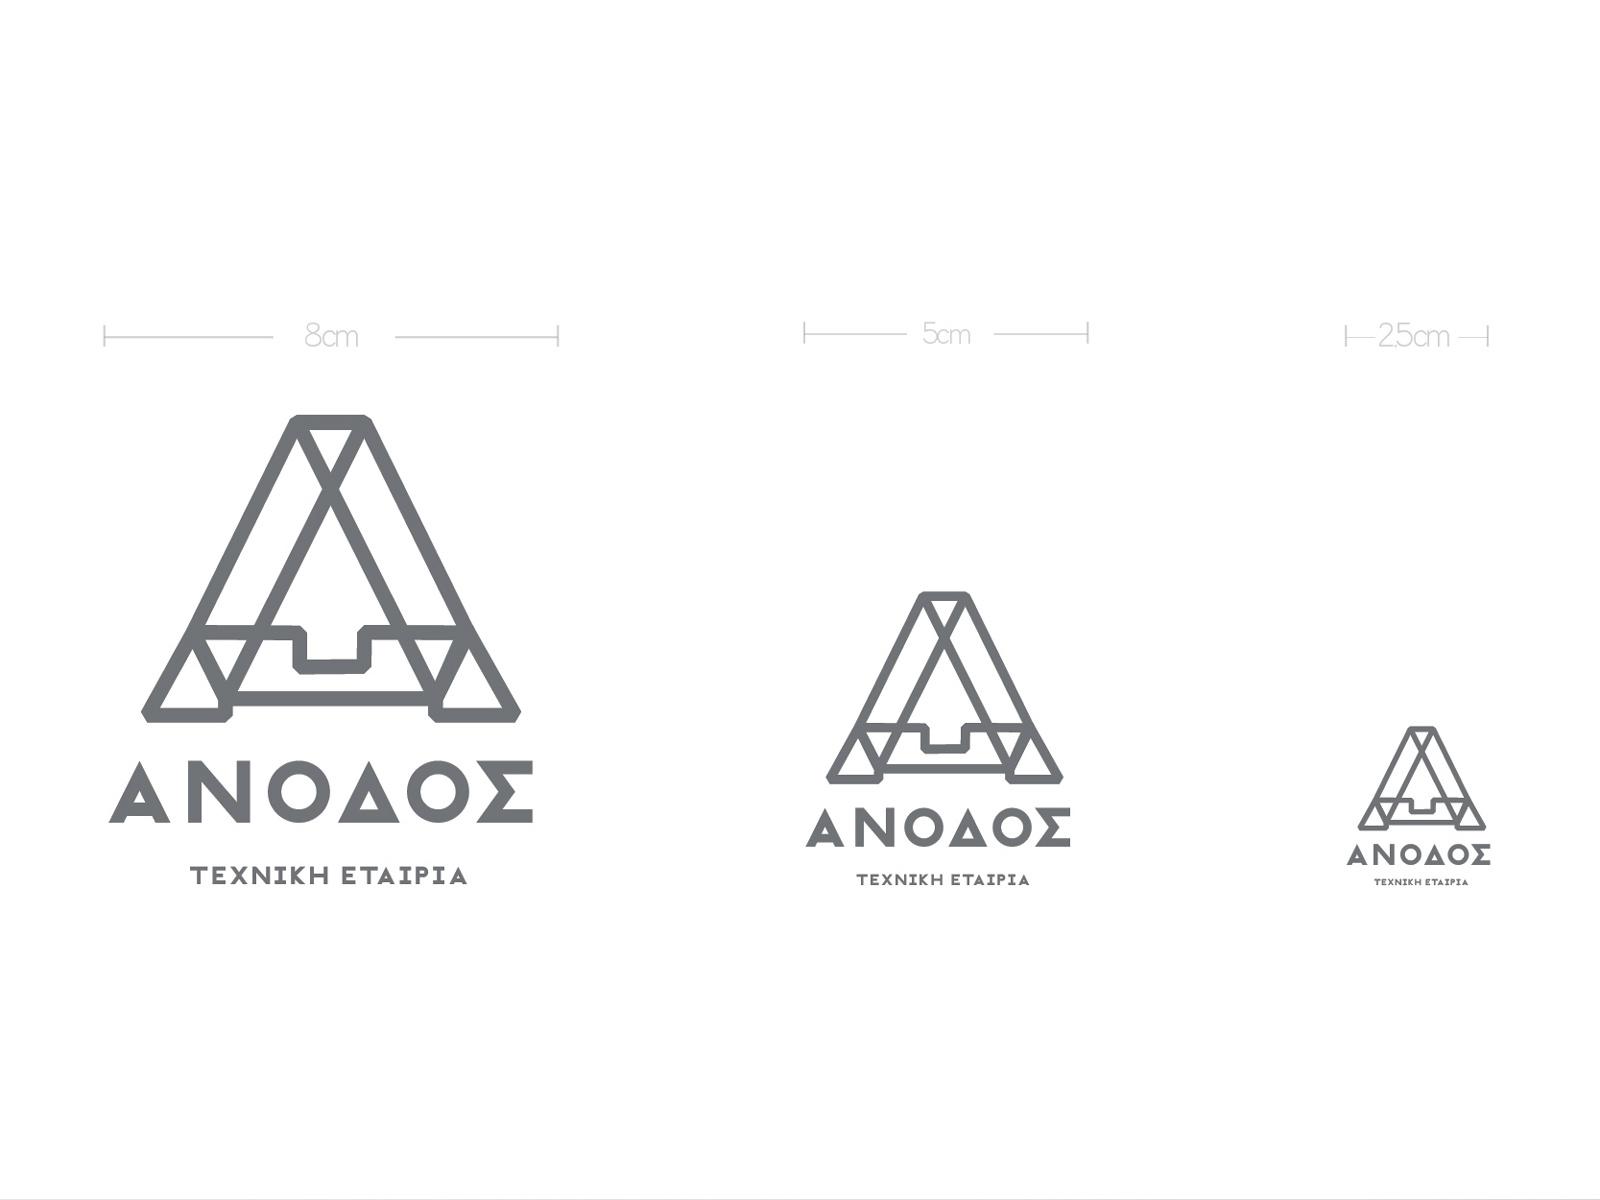 Anodos_Presentation-1_2-04